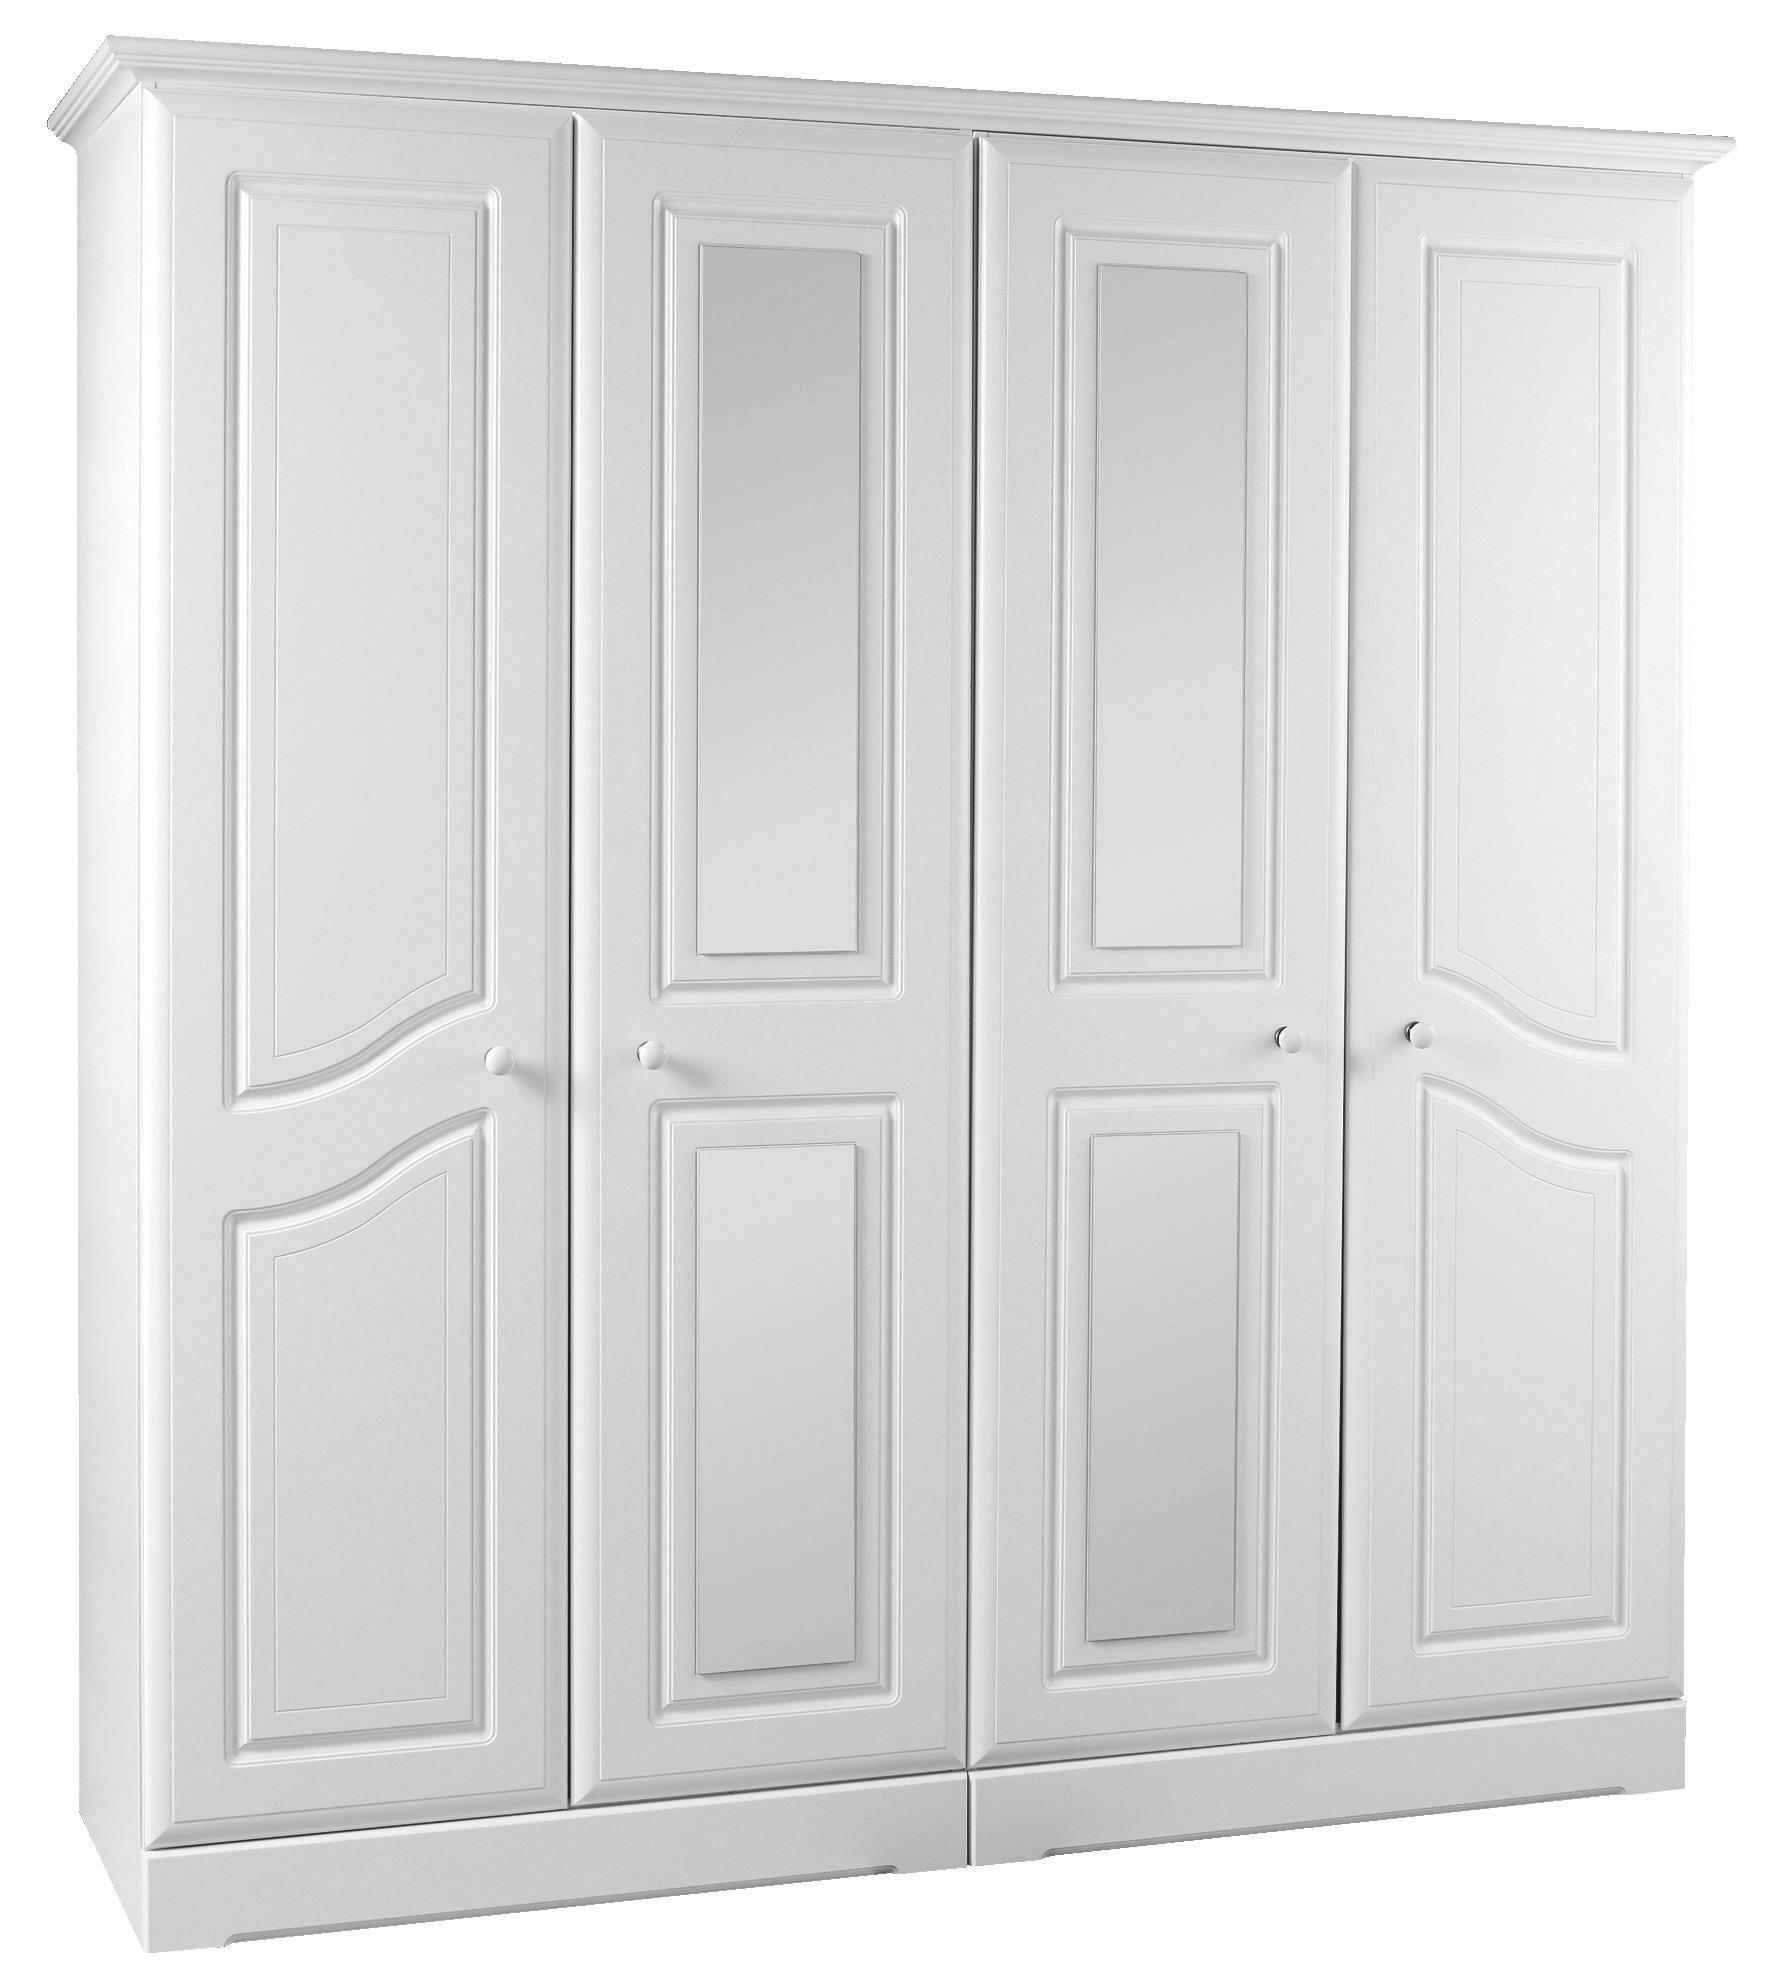 Rocco White Painted 4 Door Mirror Wardrobe (H)1980mm (W)1870mm | Departments | DIY at B\u0026Q